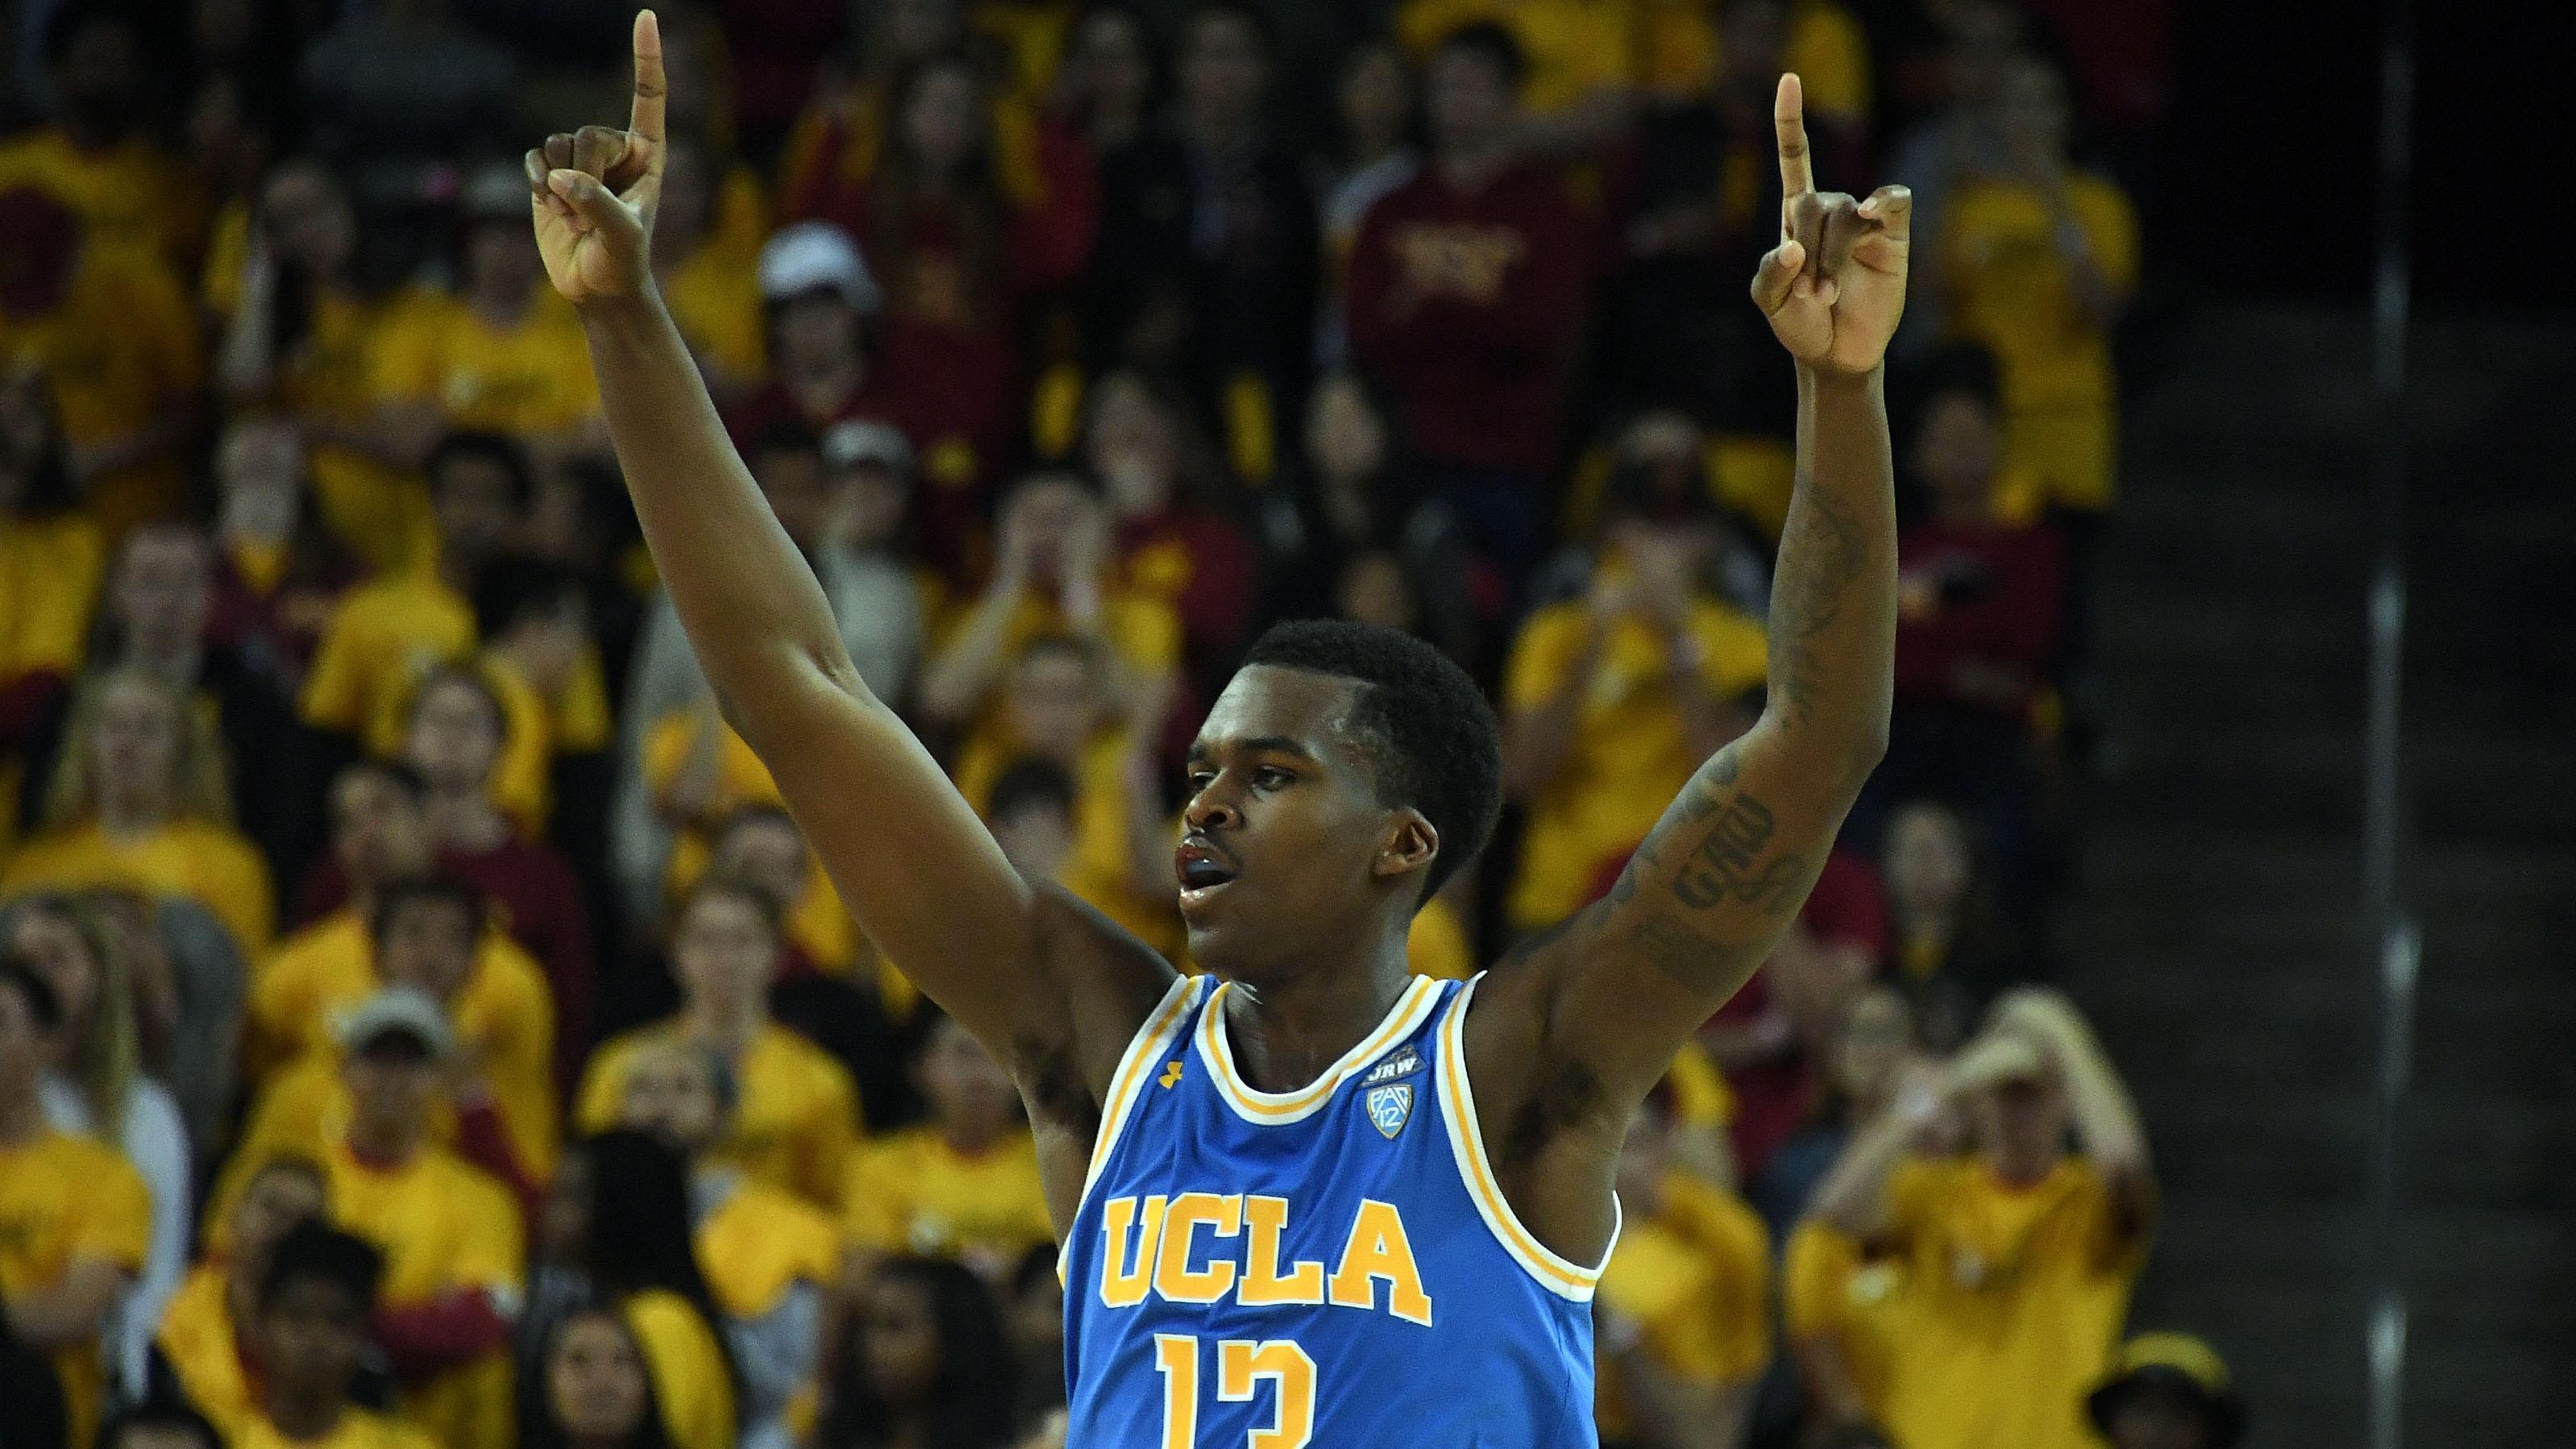 UCLA's Kris Wilkes celebrates